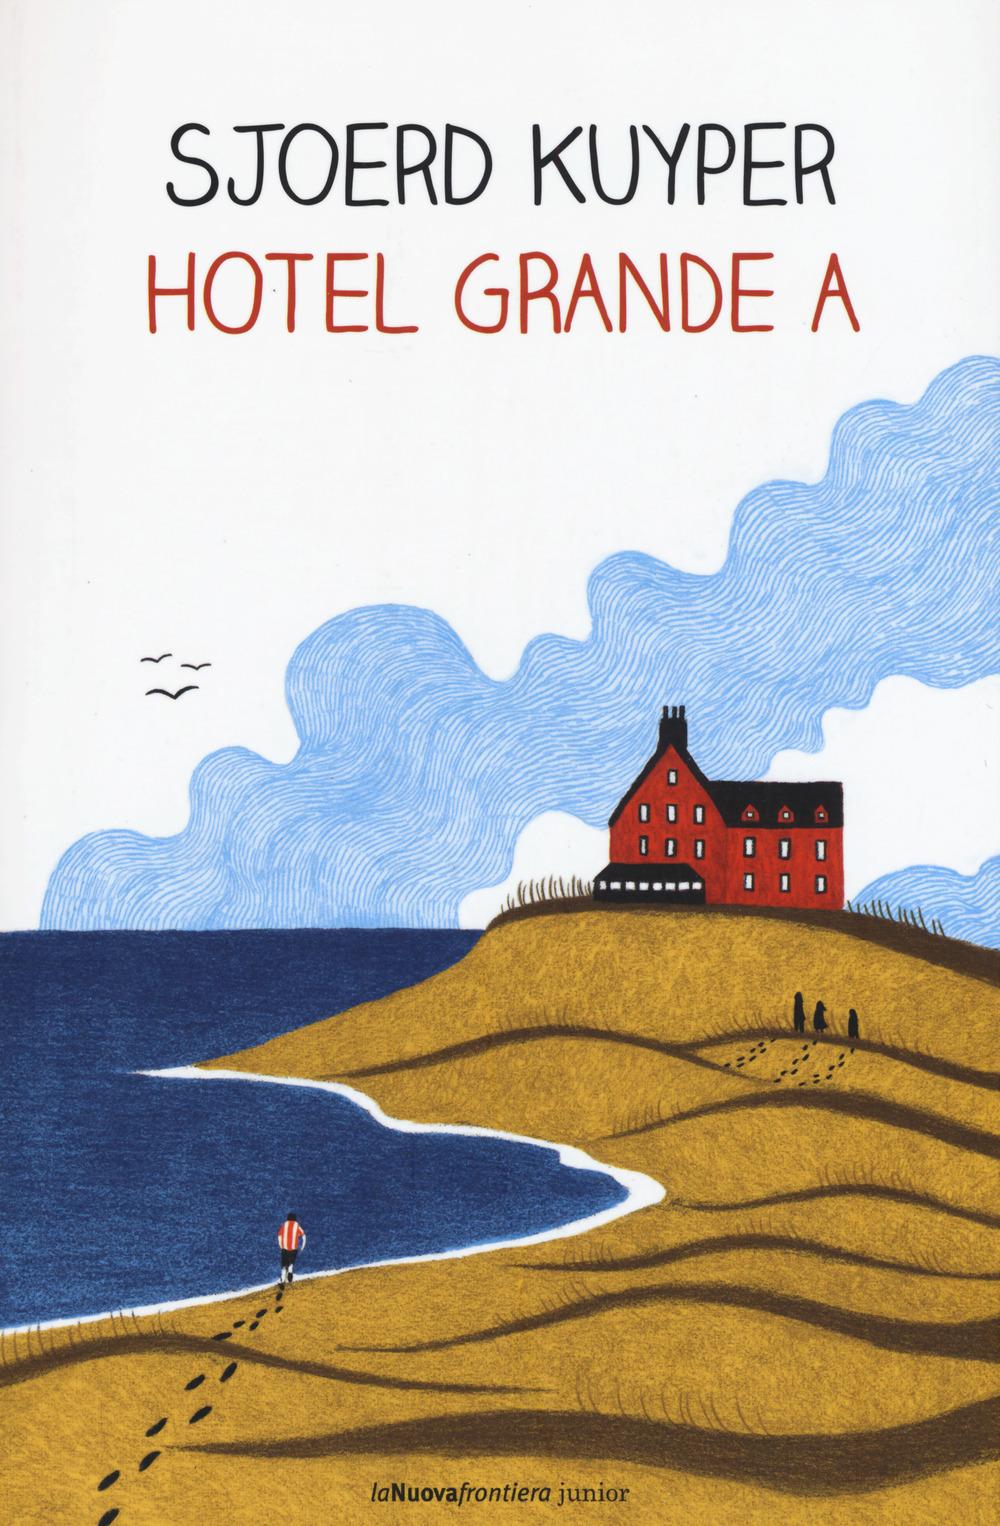 Hotel Grande A di Sjoerd Kuyper (laNuovafrontieraJunior)